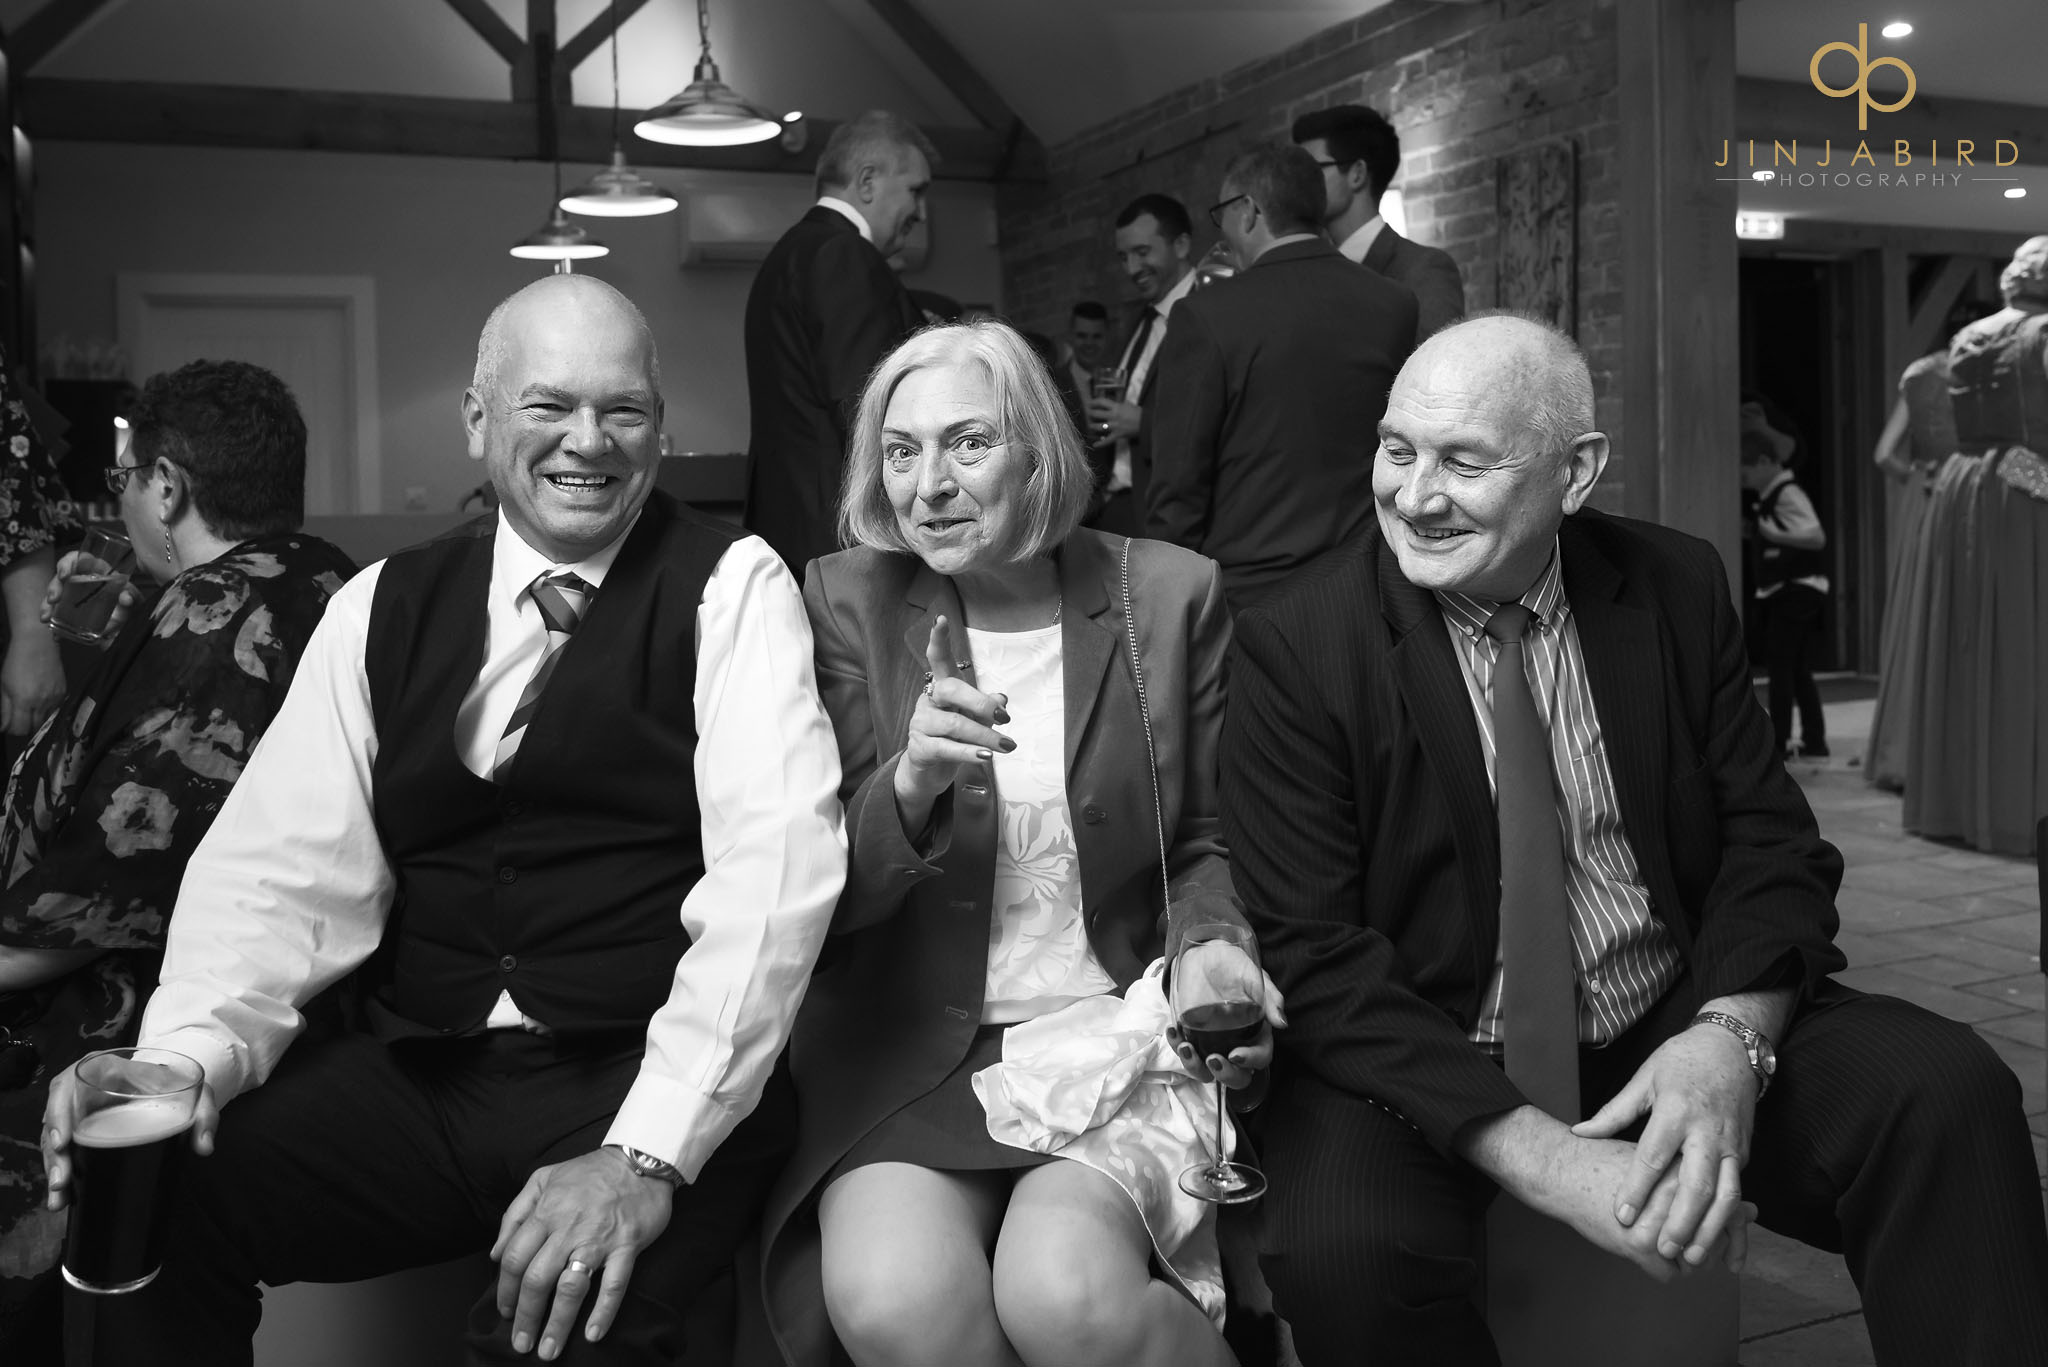 wedding guests in bar bassmead manor